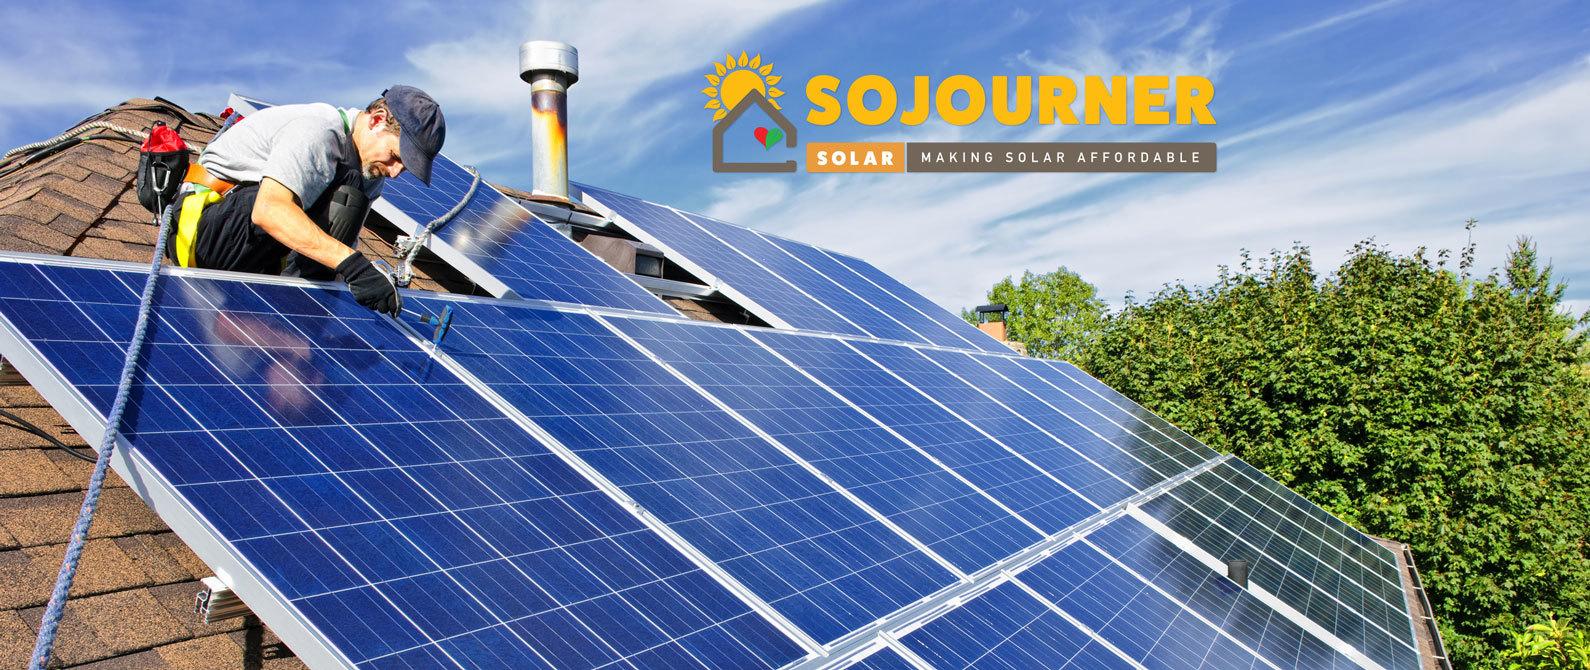 Sojourner Solar